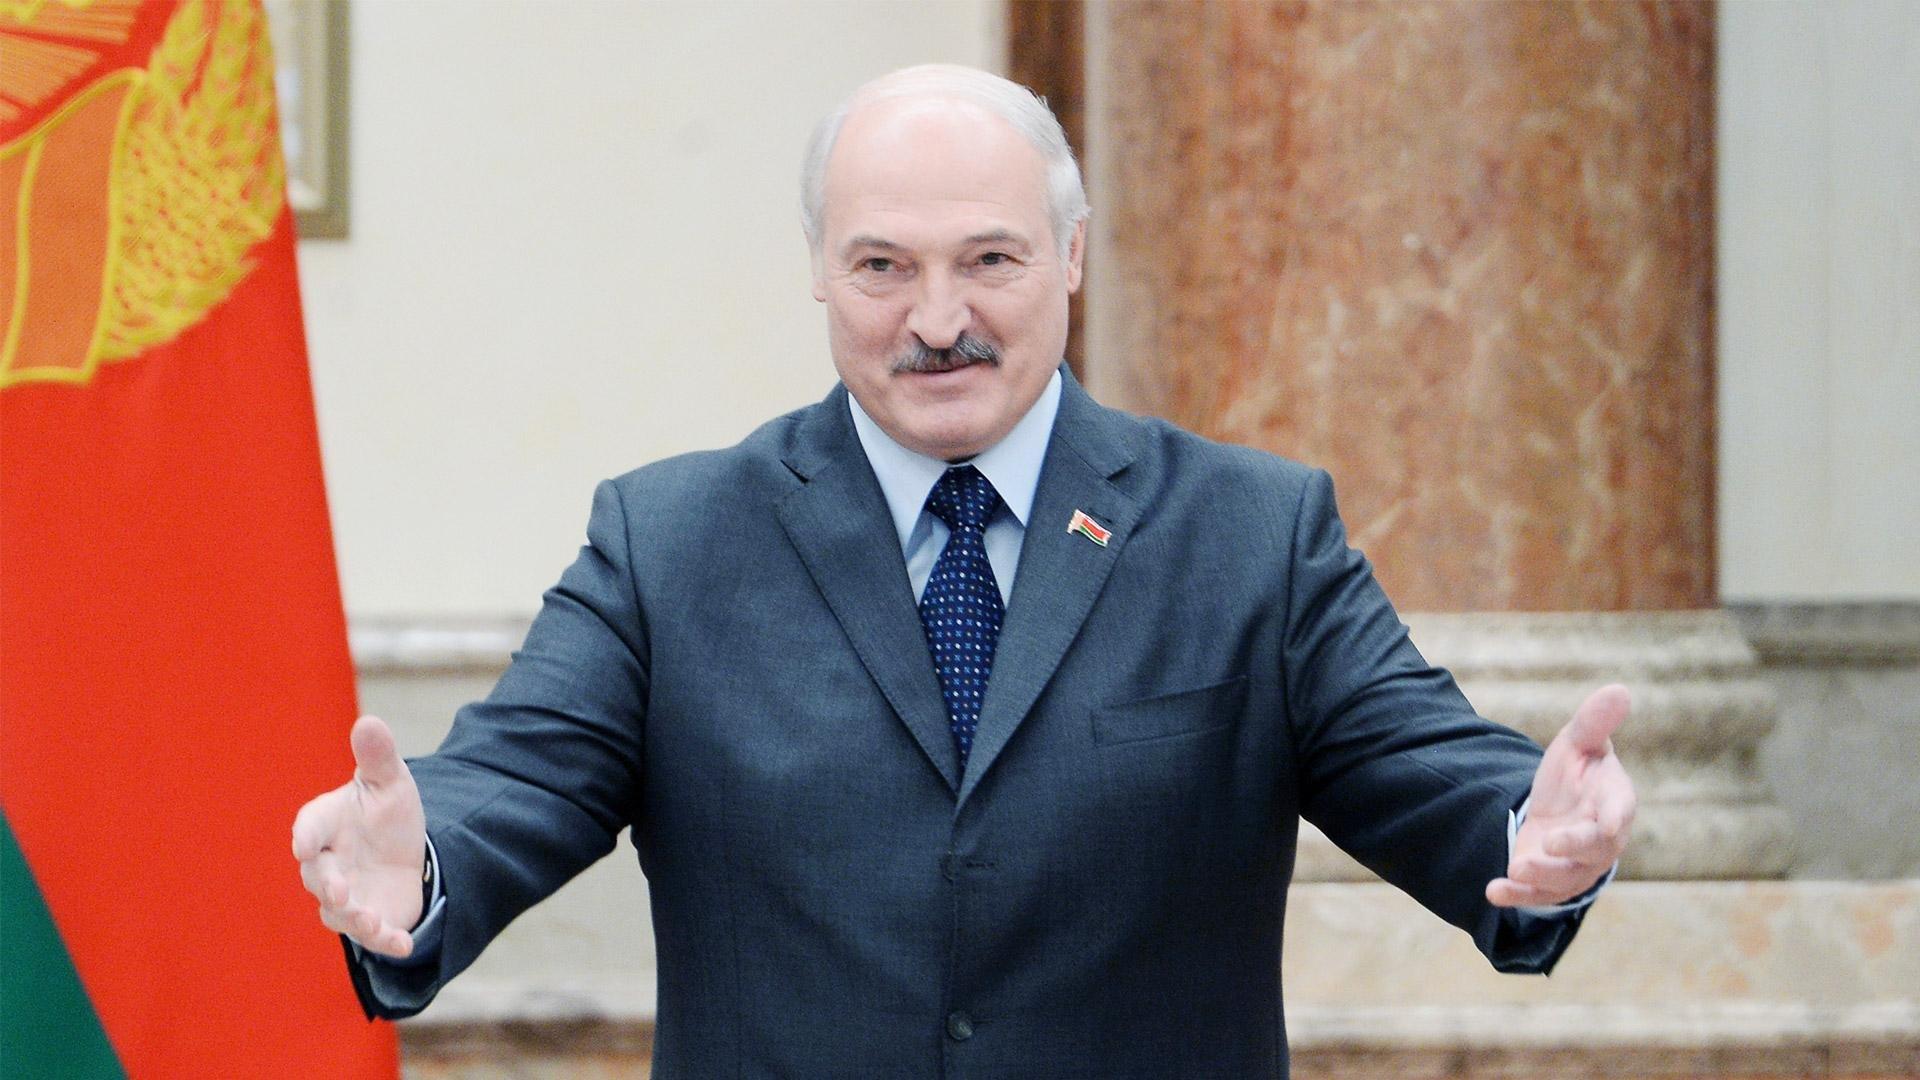 Побежавший на Запад Лукашенко получил оплеуху от Трампа